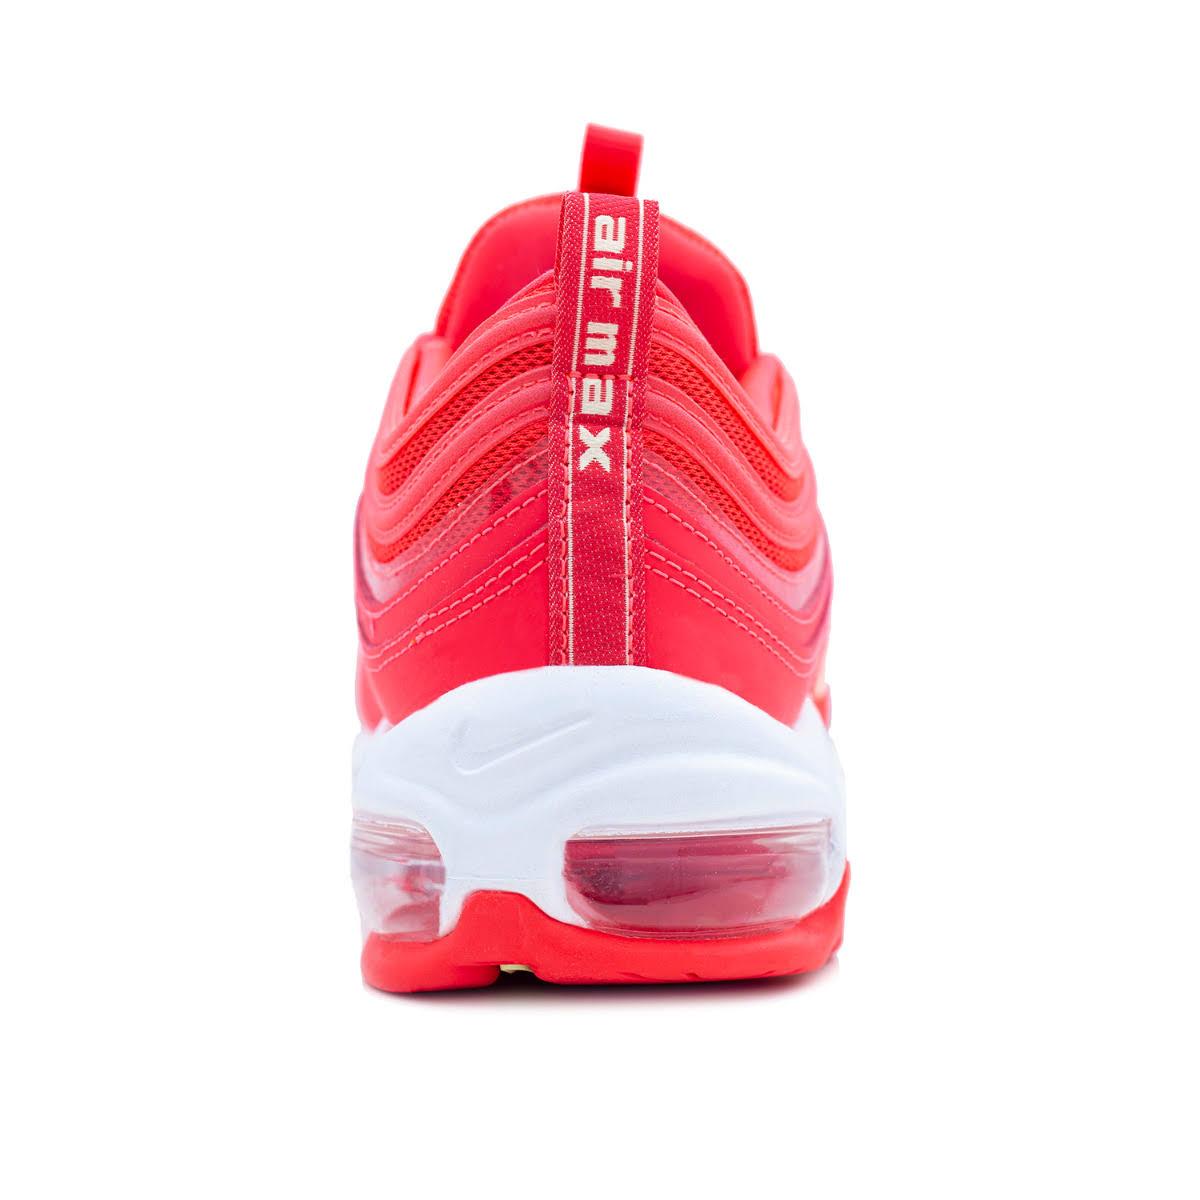 Nike Air Max 97 - Women Shoes  a5Ik6lz